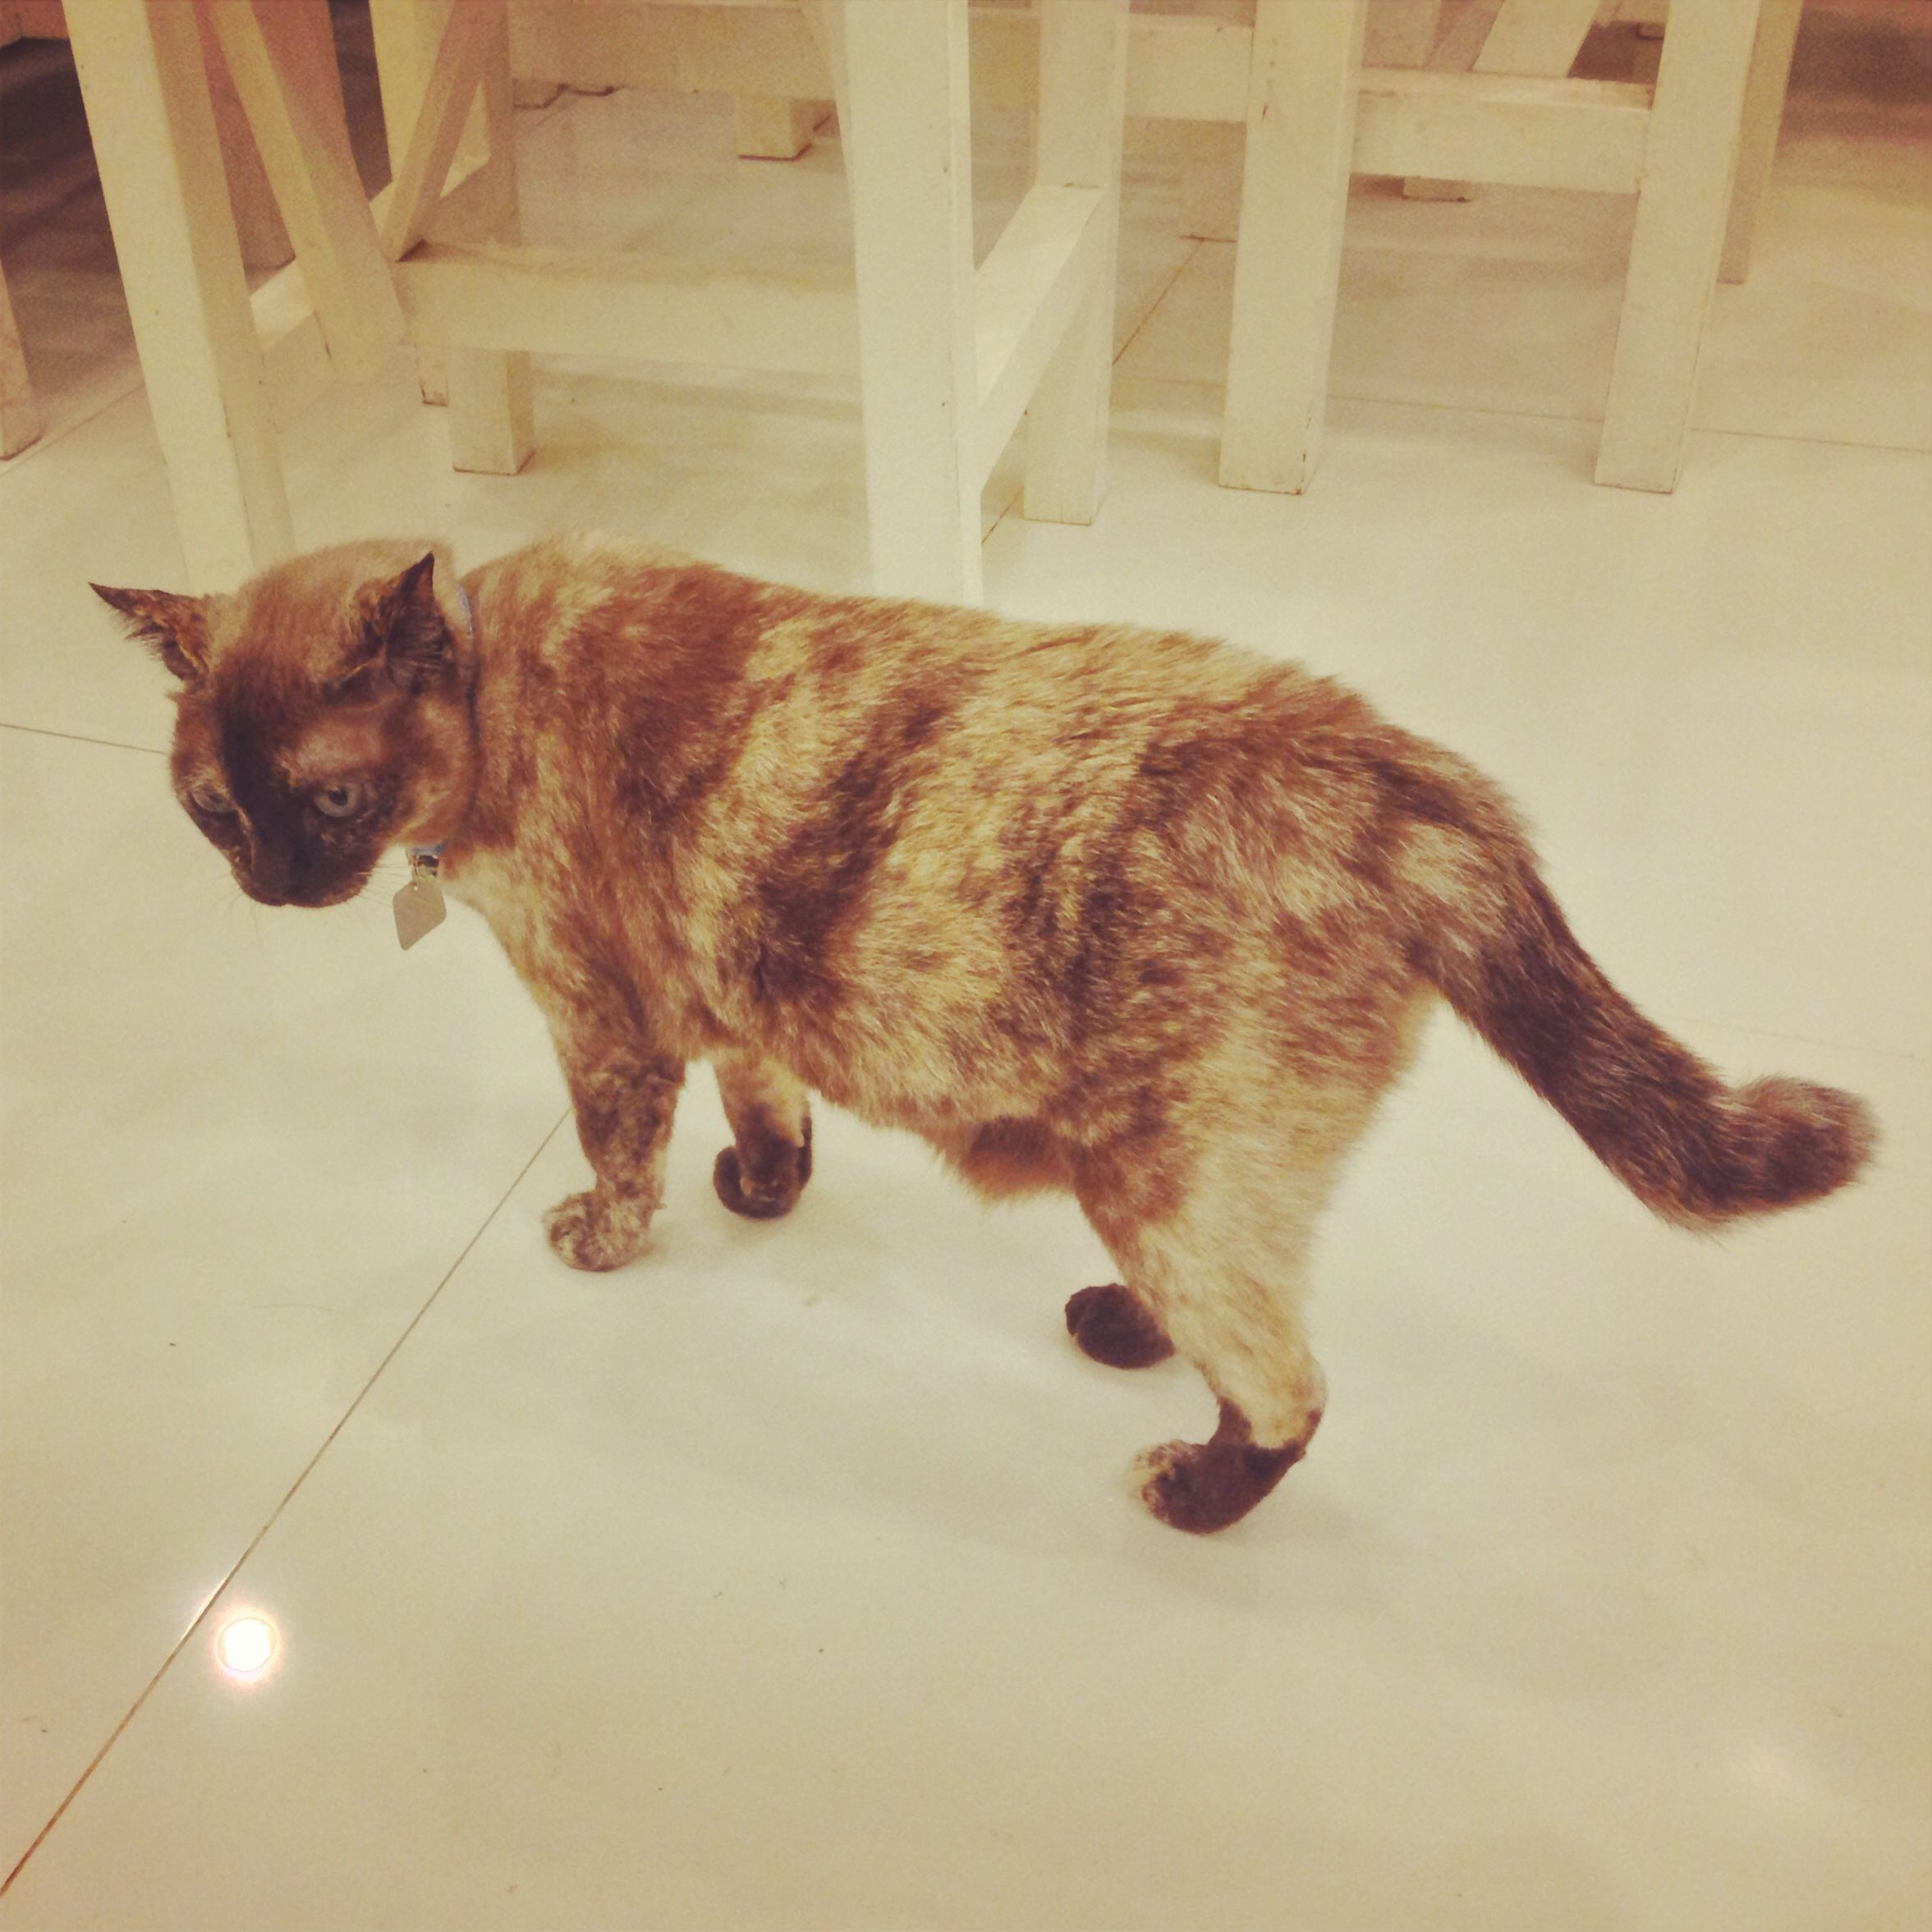 Cute Thai Siam Siamese Cat Cats Kitty Kitten Kittens แมว ล กแมว ไทย สยาม น าร ก Udoncat Udon Udonthani แมวอ ดร อ ดร อ ดรธ ล กแมว แมว น าร ก